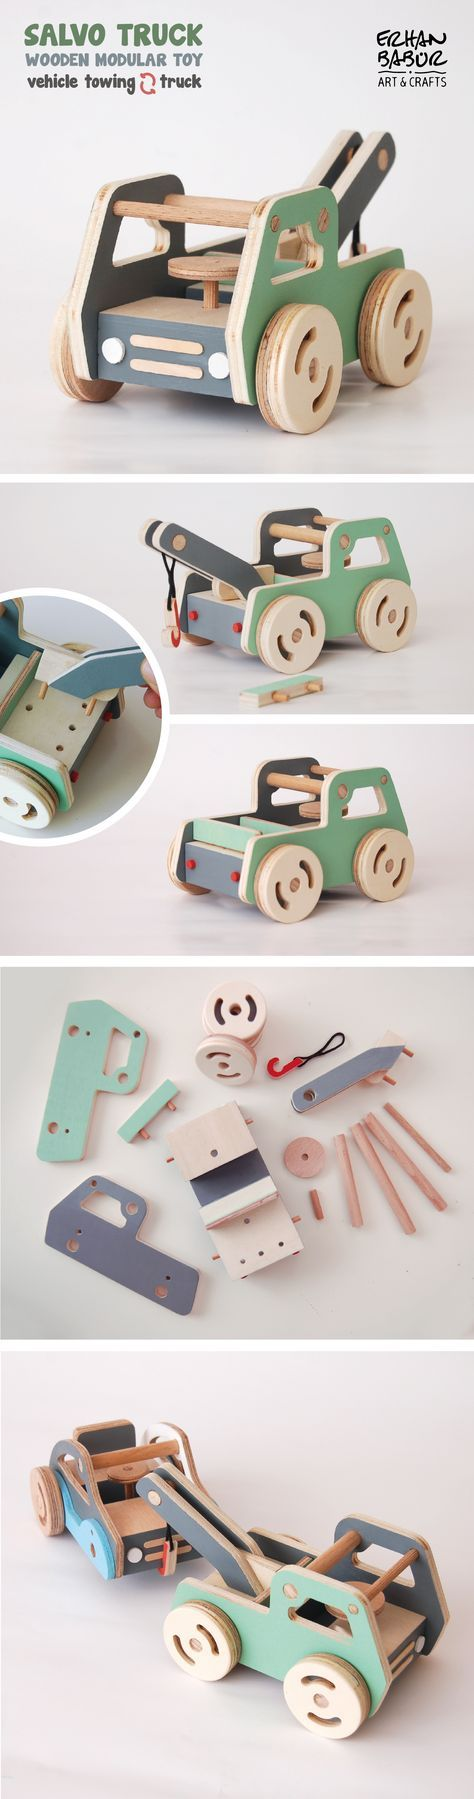 Salvo Truck Wooden modular toy